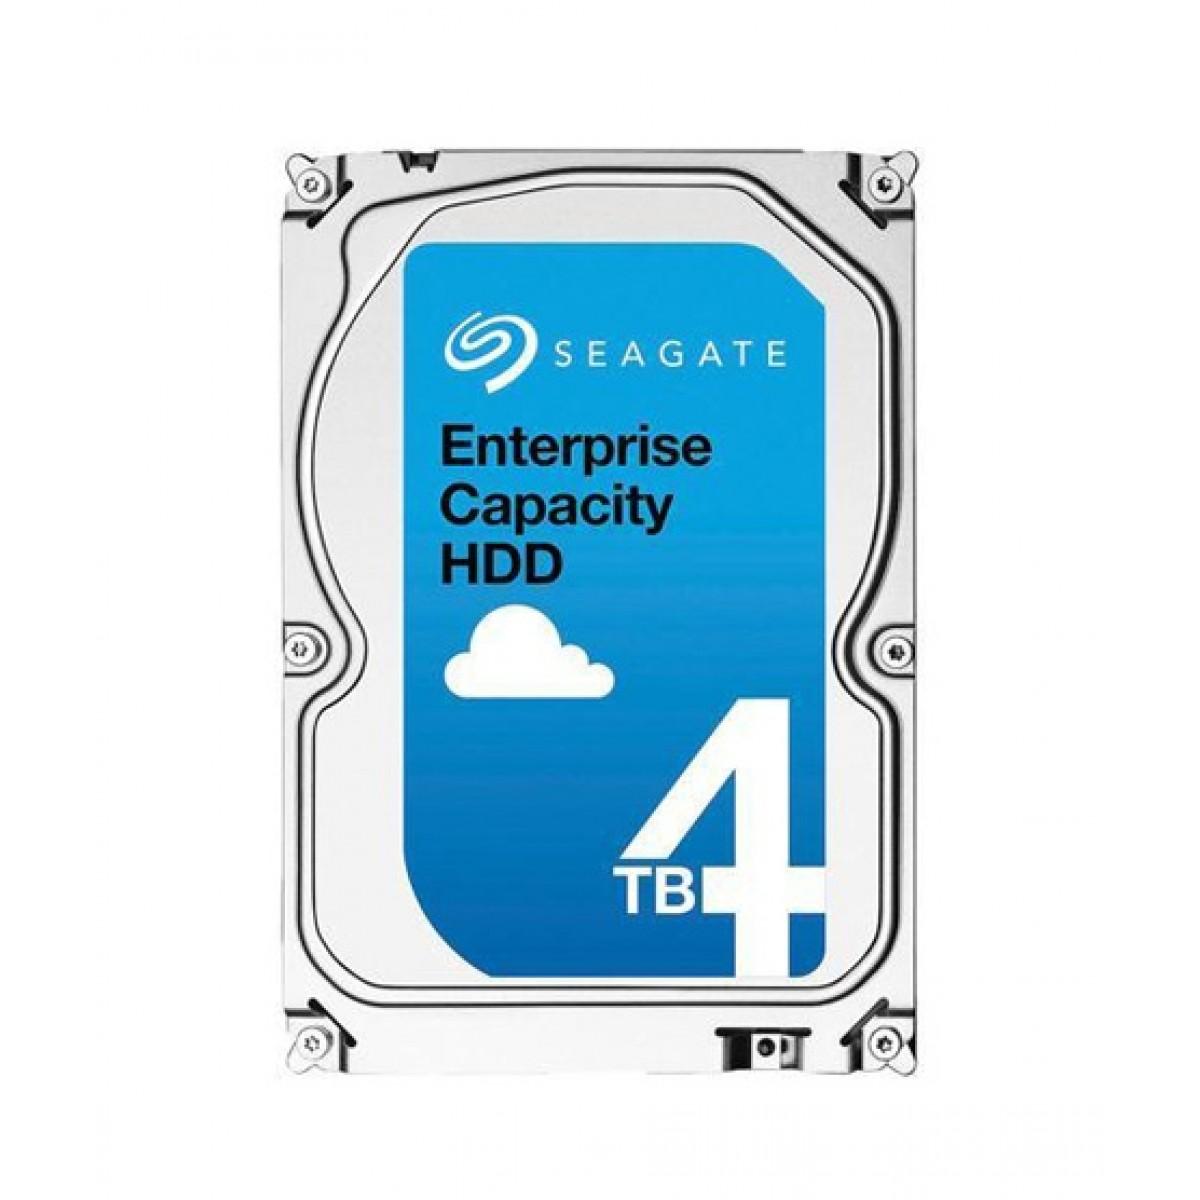 Seagate Enterprise SAS 4TB 7200RPM Hard